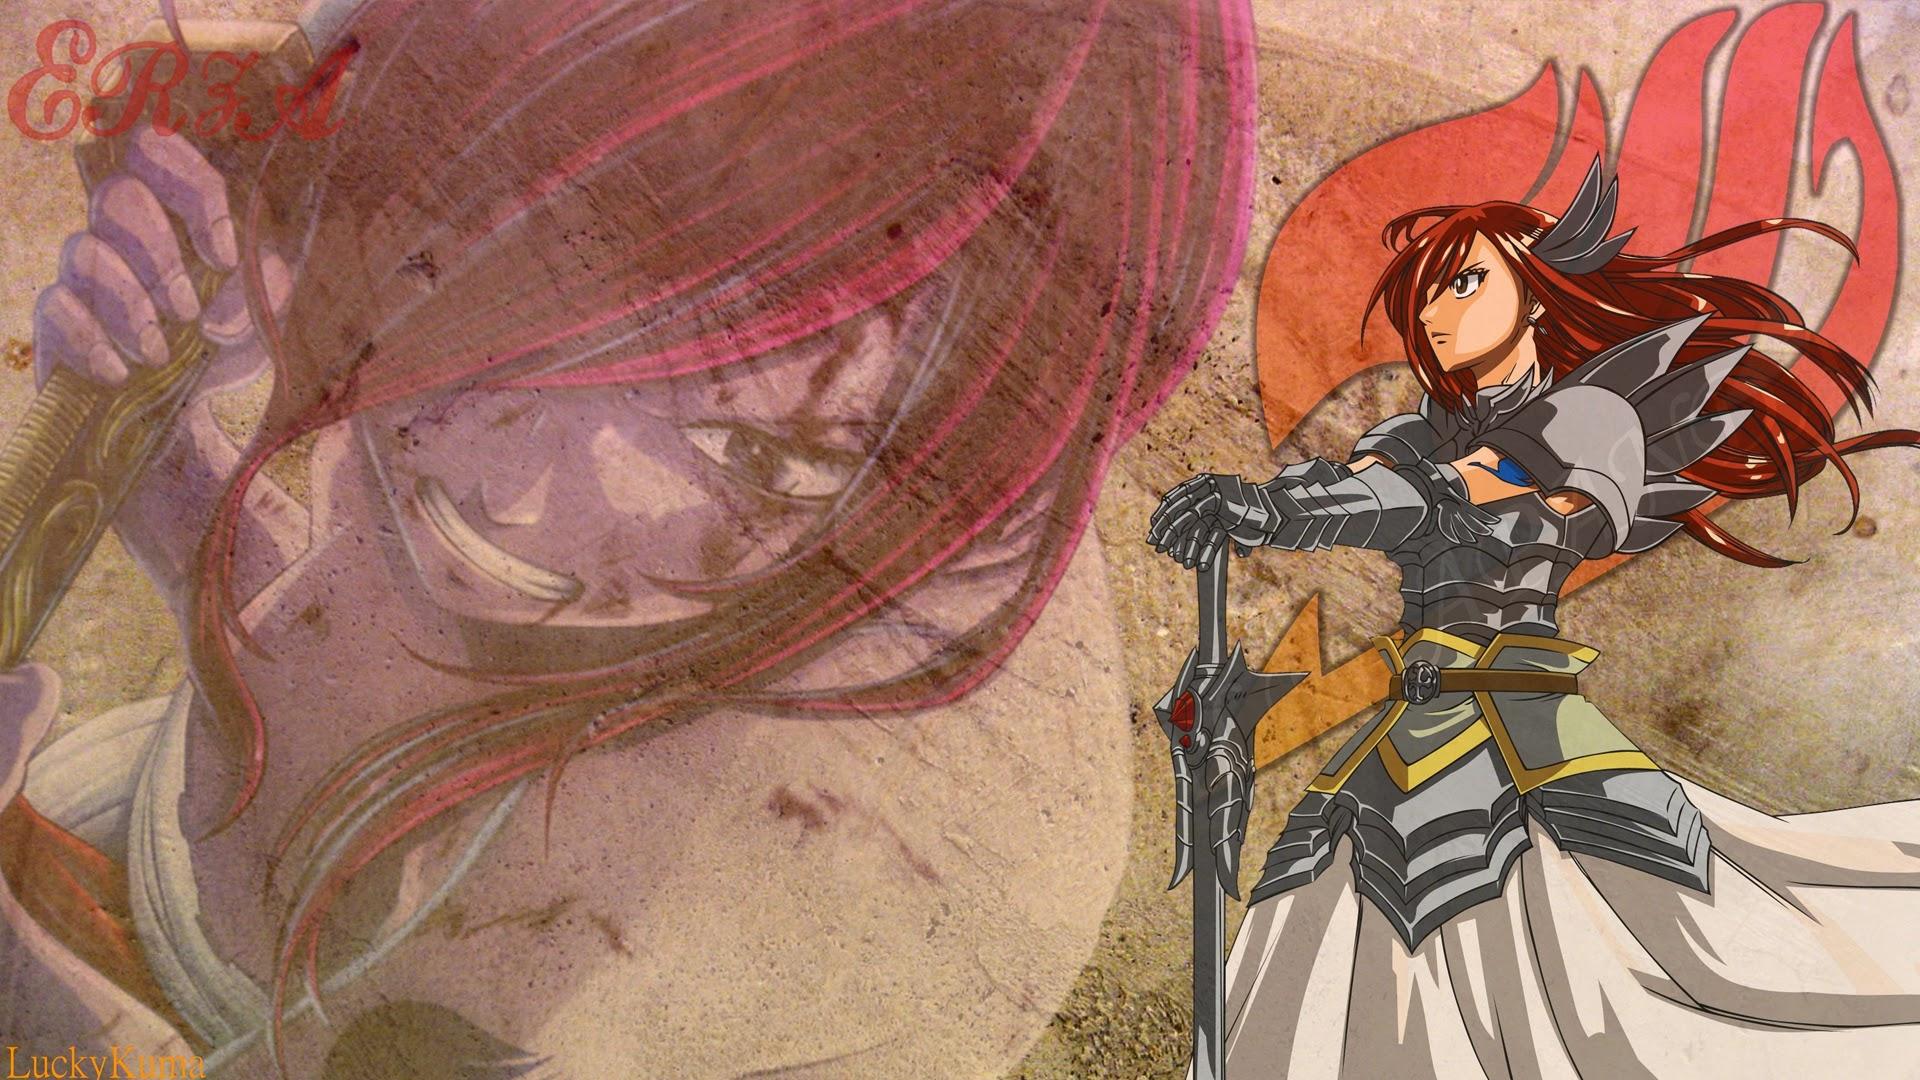 erza scarlet wallpaper hd fairy tail anime girl armor 1920x1080 a695 1920x1080